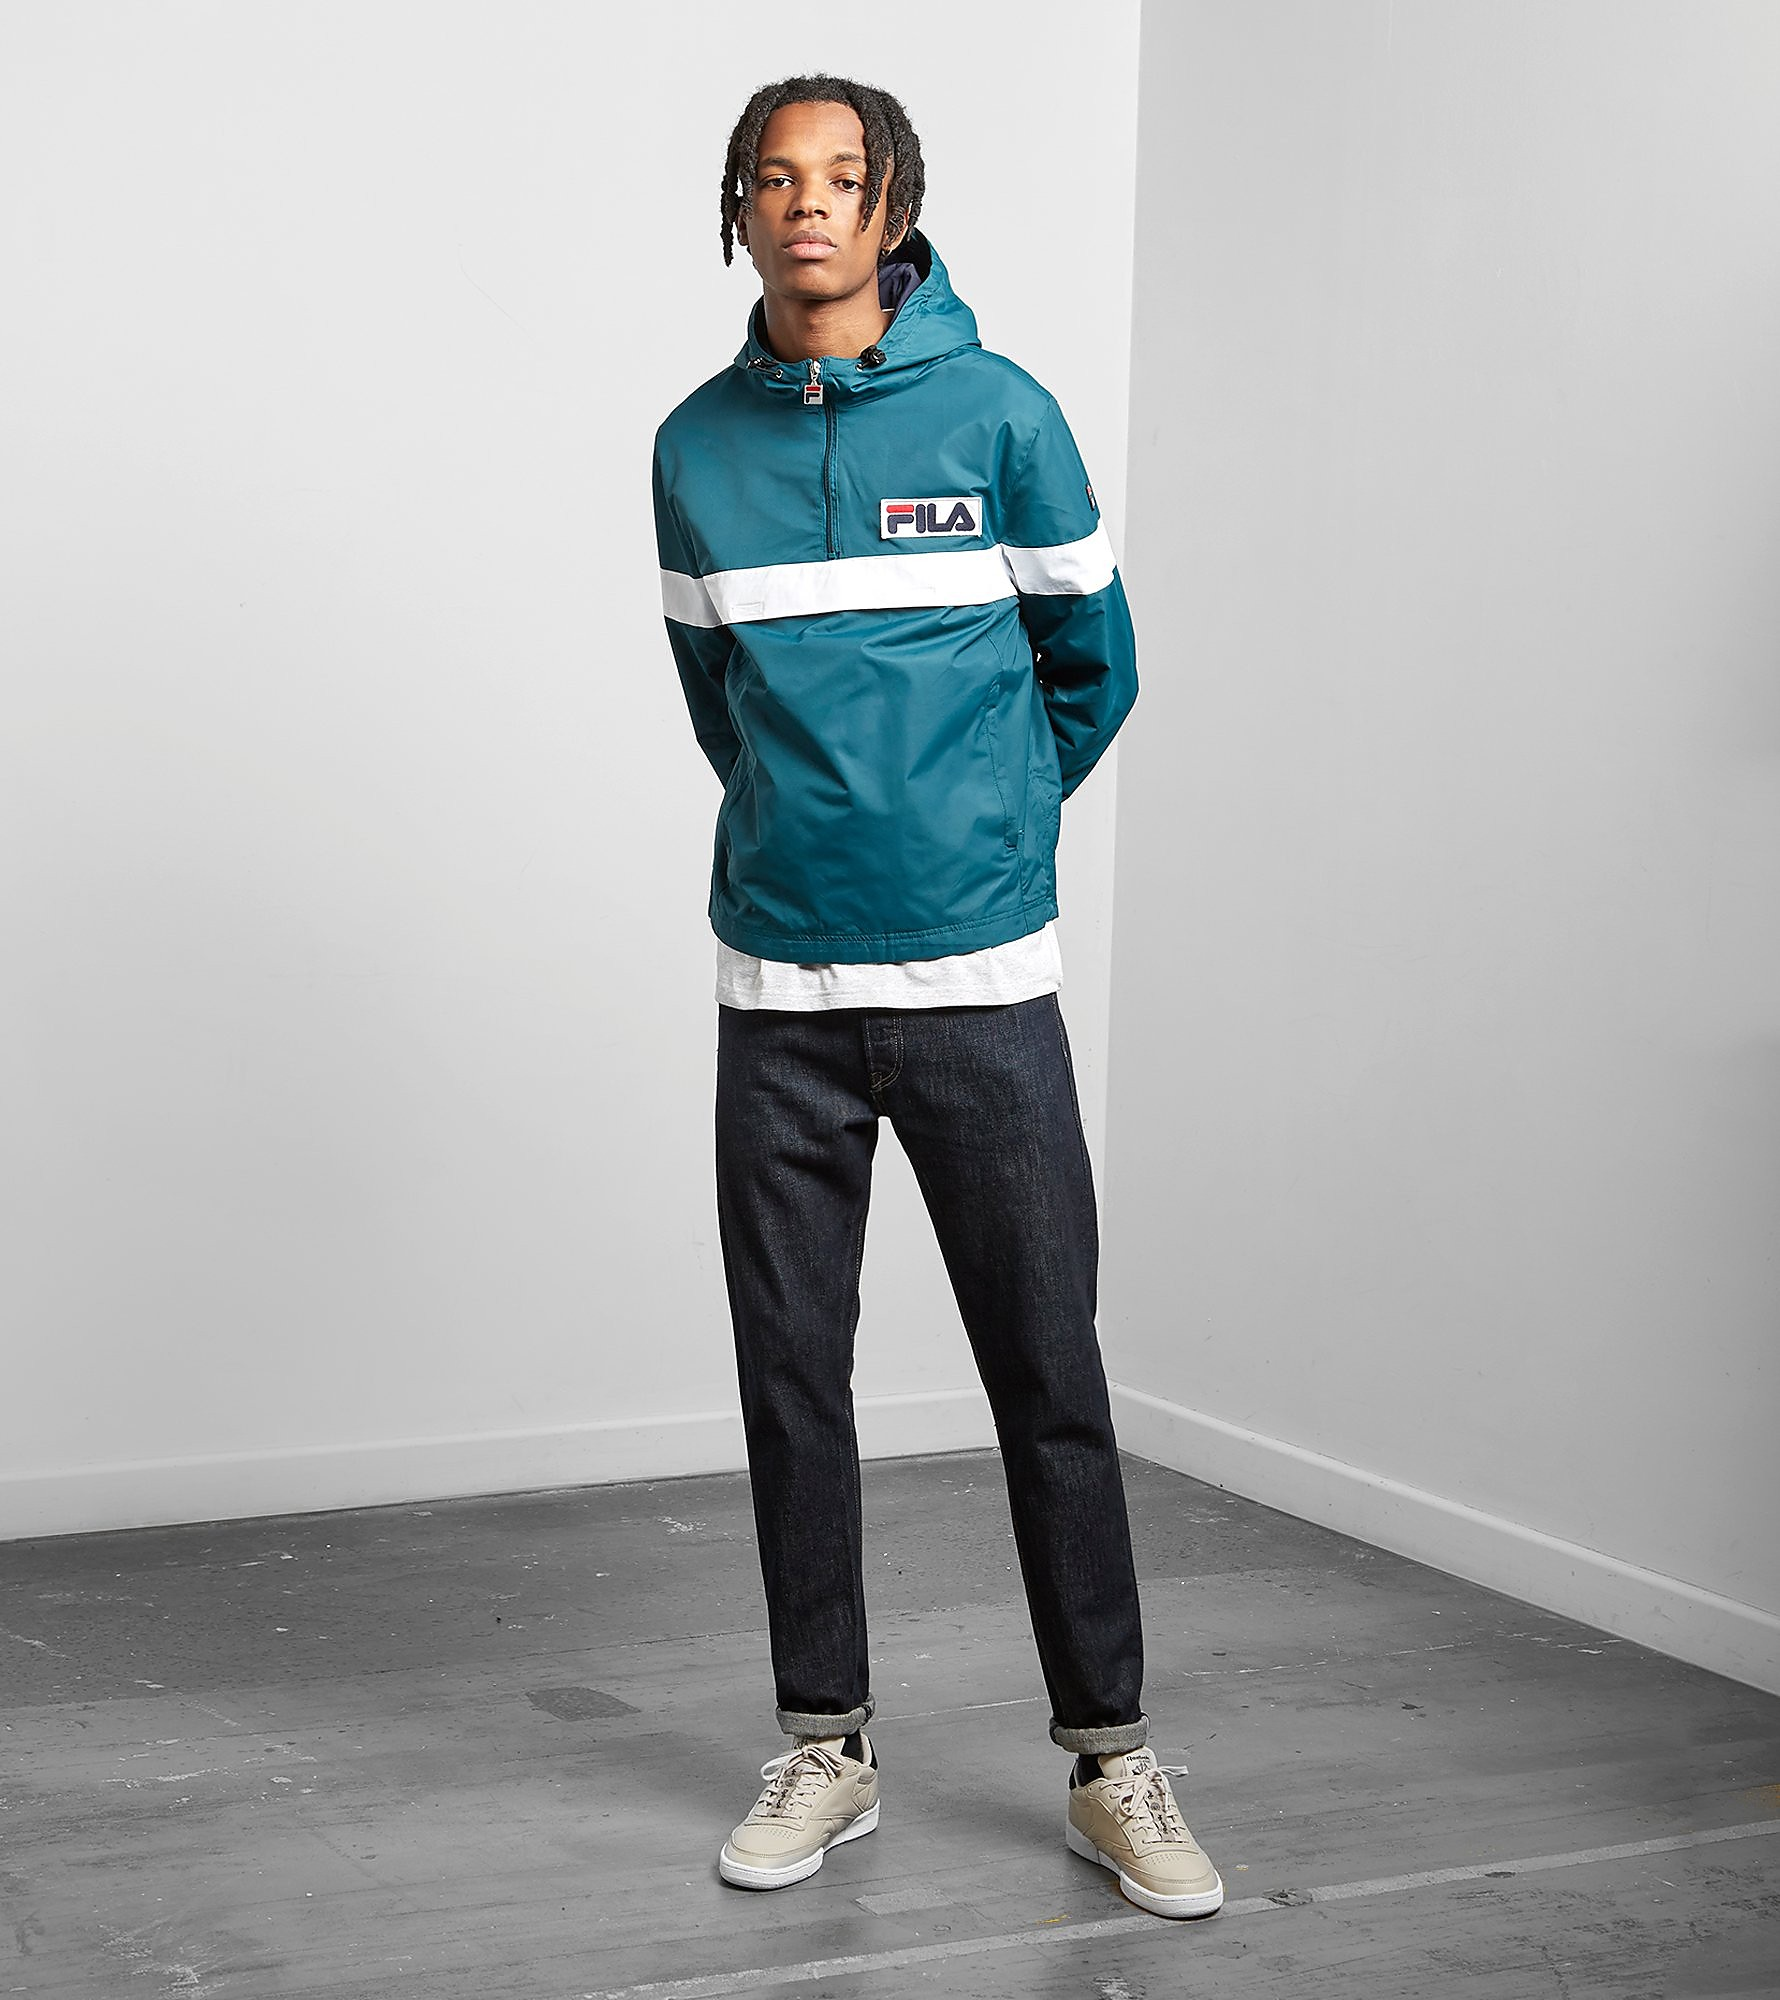 Fila Viloa Jacket - size? Exklusiv